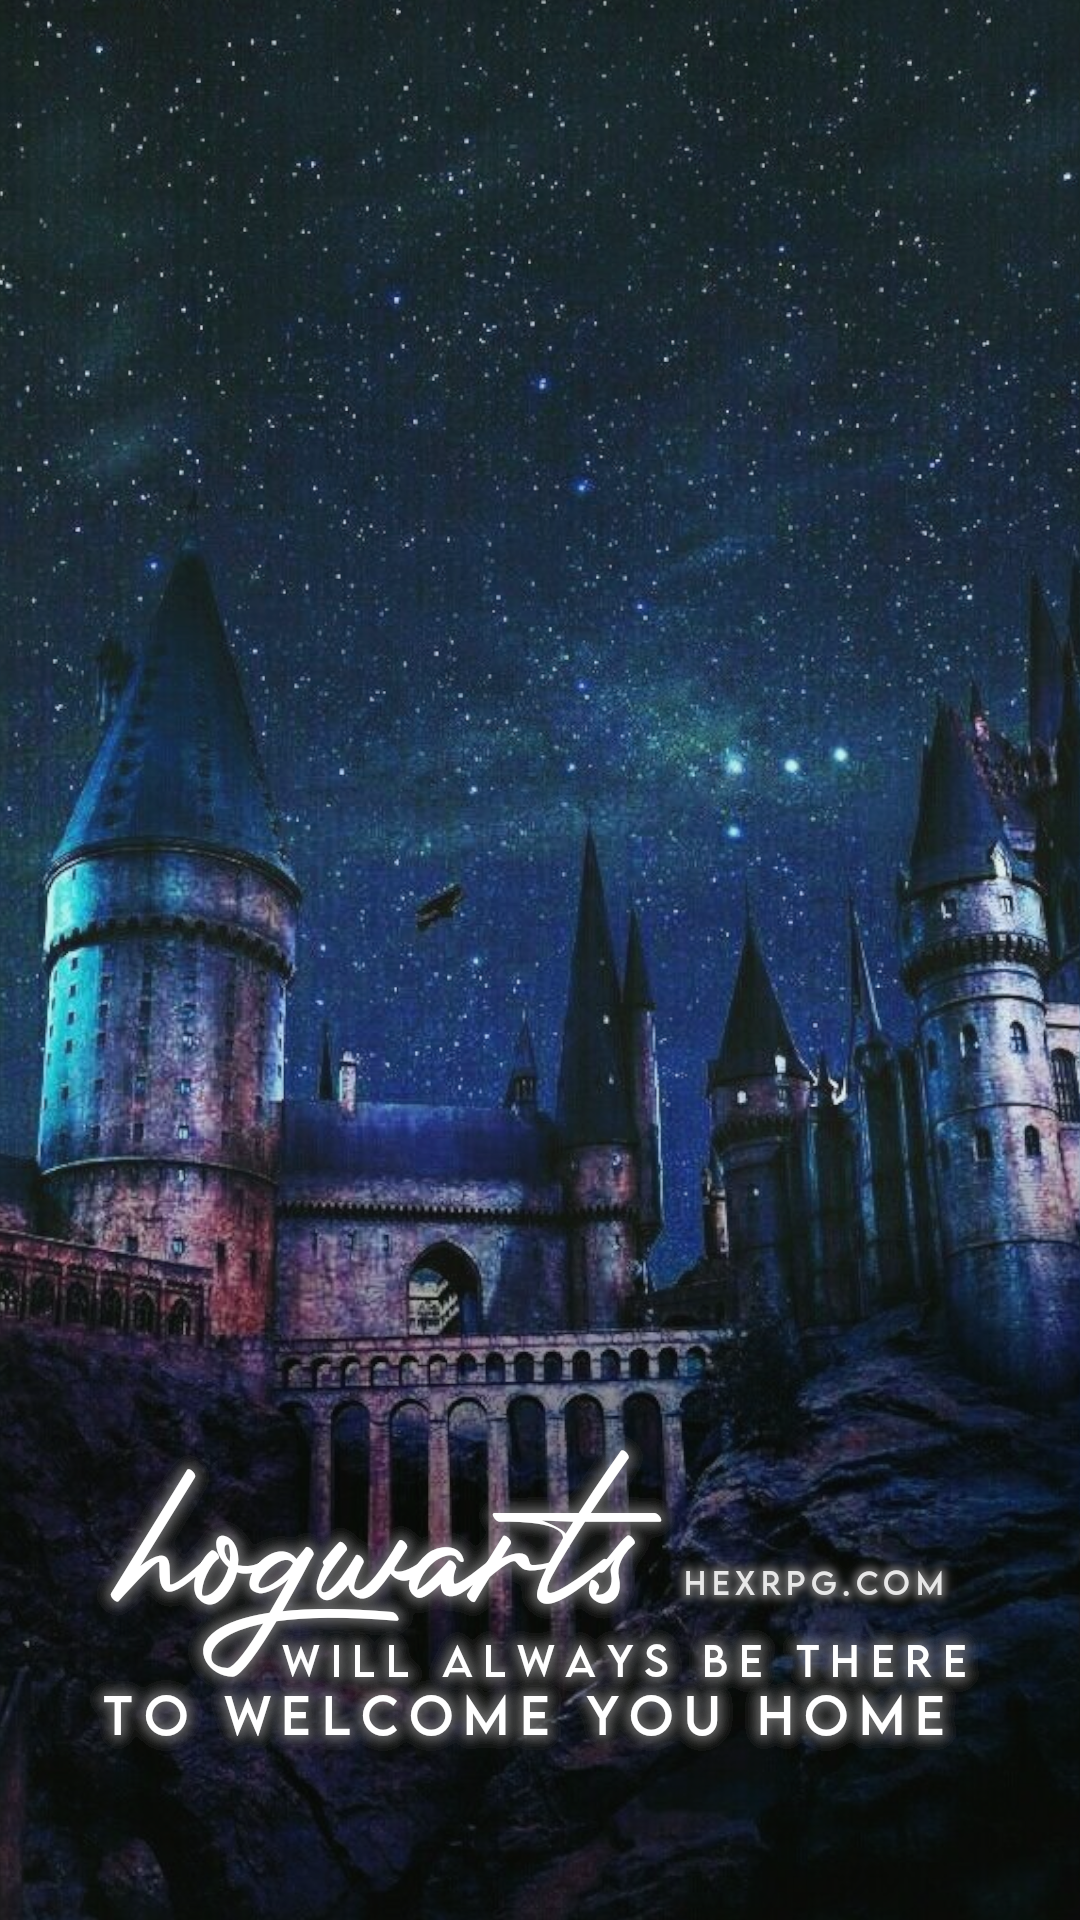 Hexrpg Hogwarts Wallpaper Hogwarts Extreme Hogwarts Harry Potter Experience